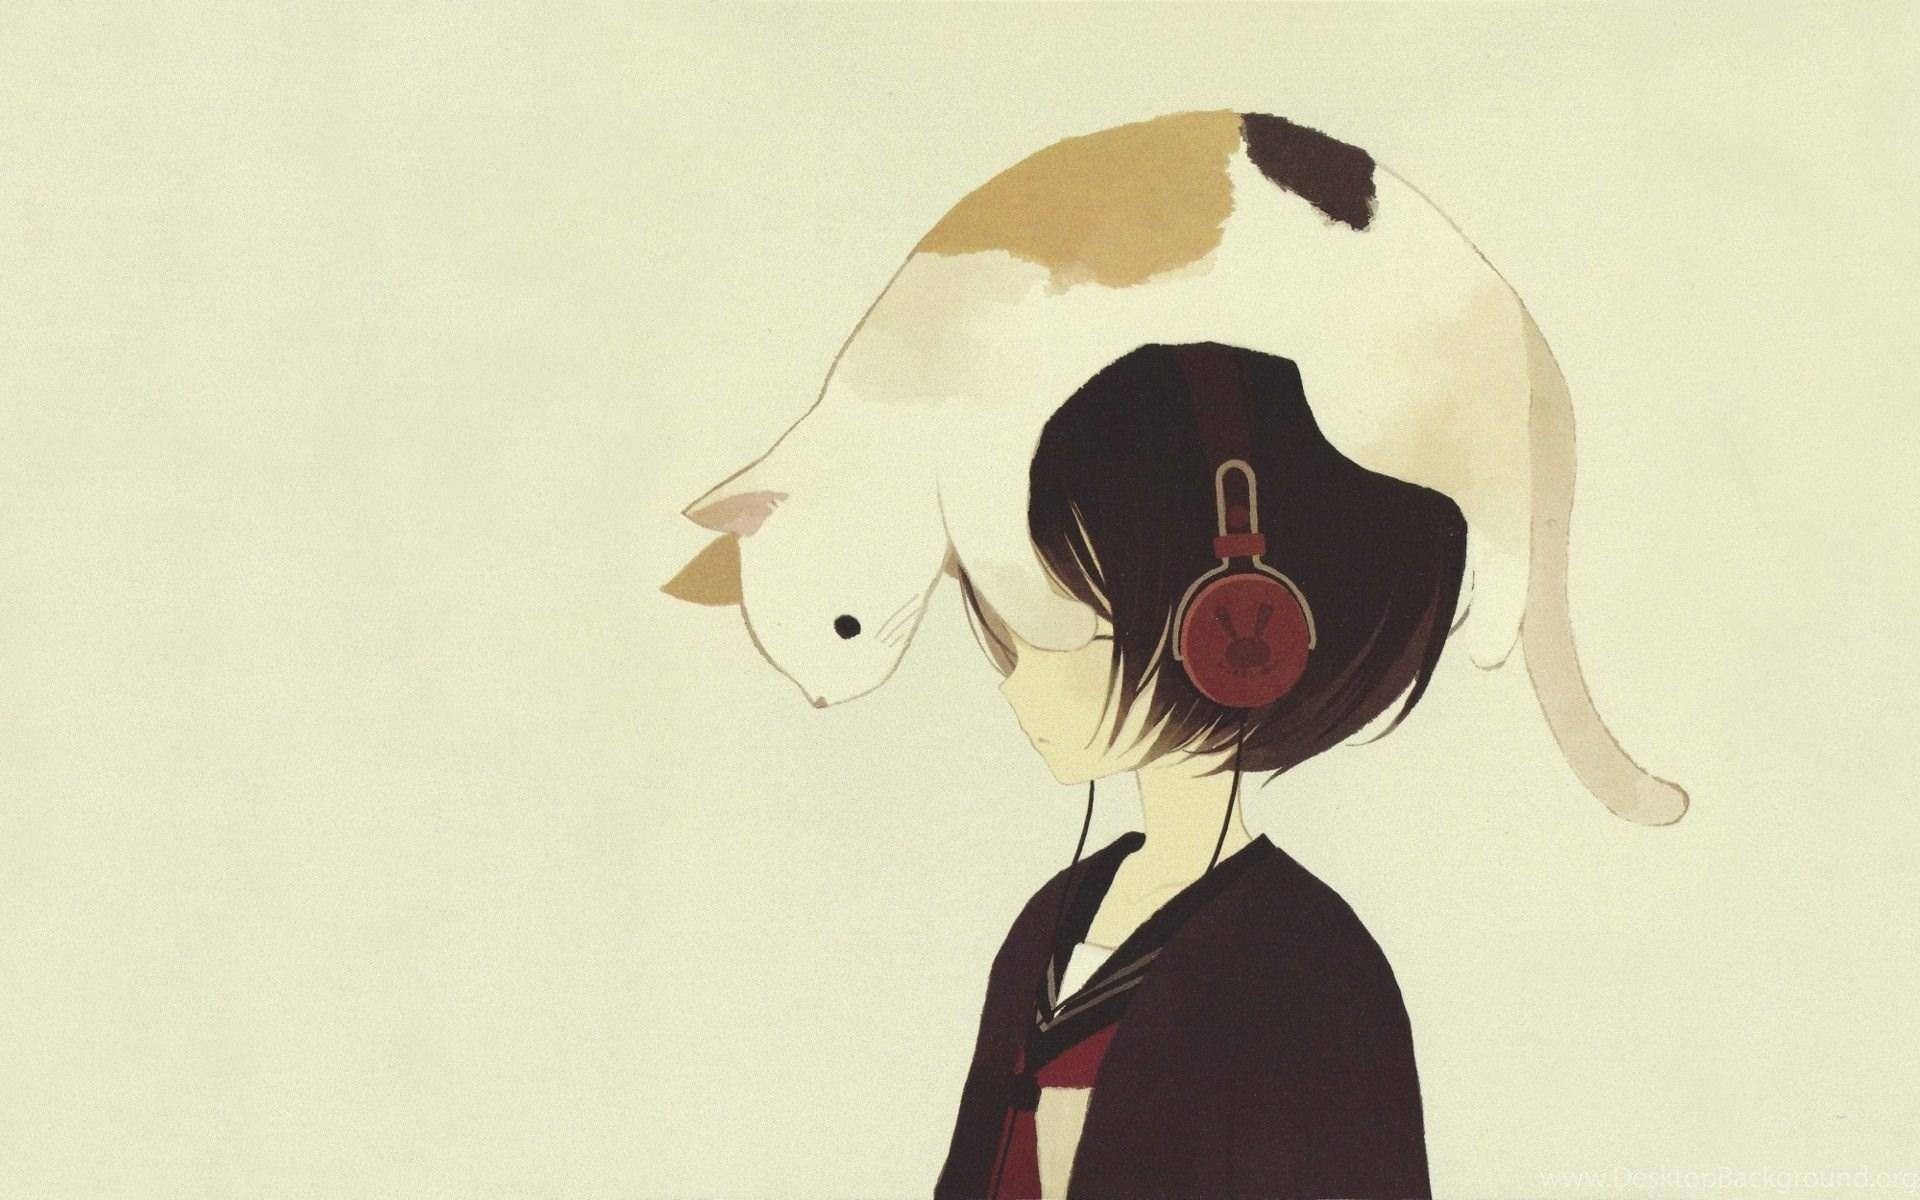 Anime Girls With Headphones Wallpapers Desktop Background